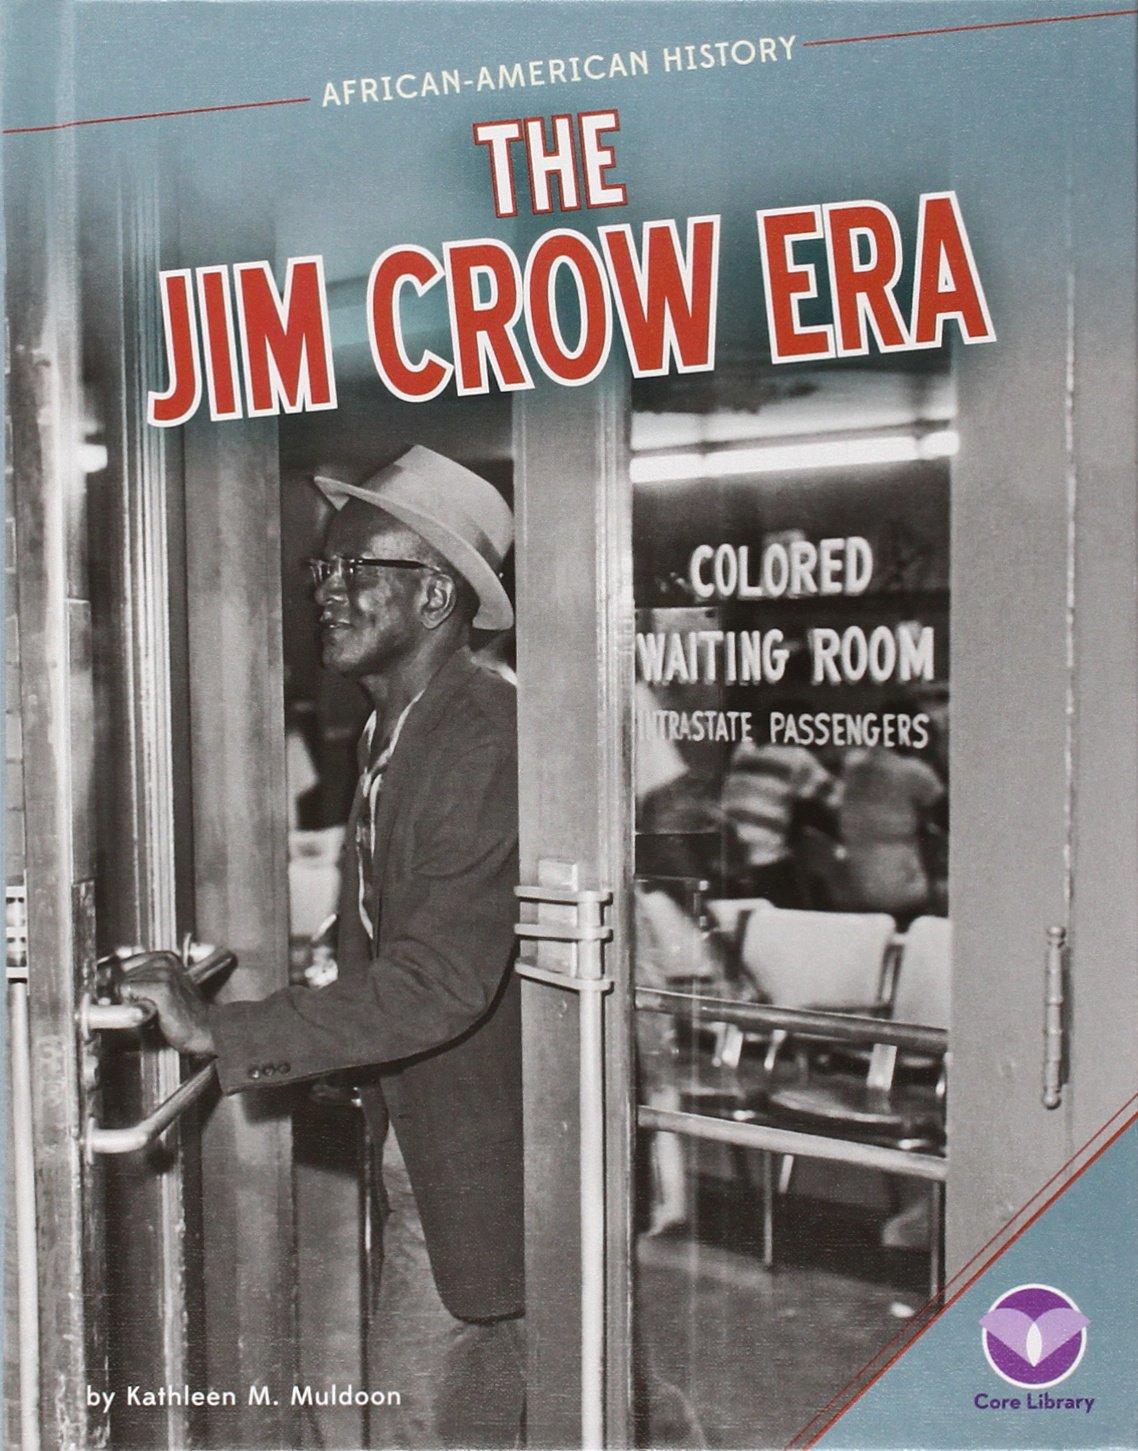 Jim Crow Era (African-American History)